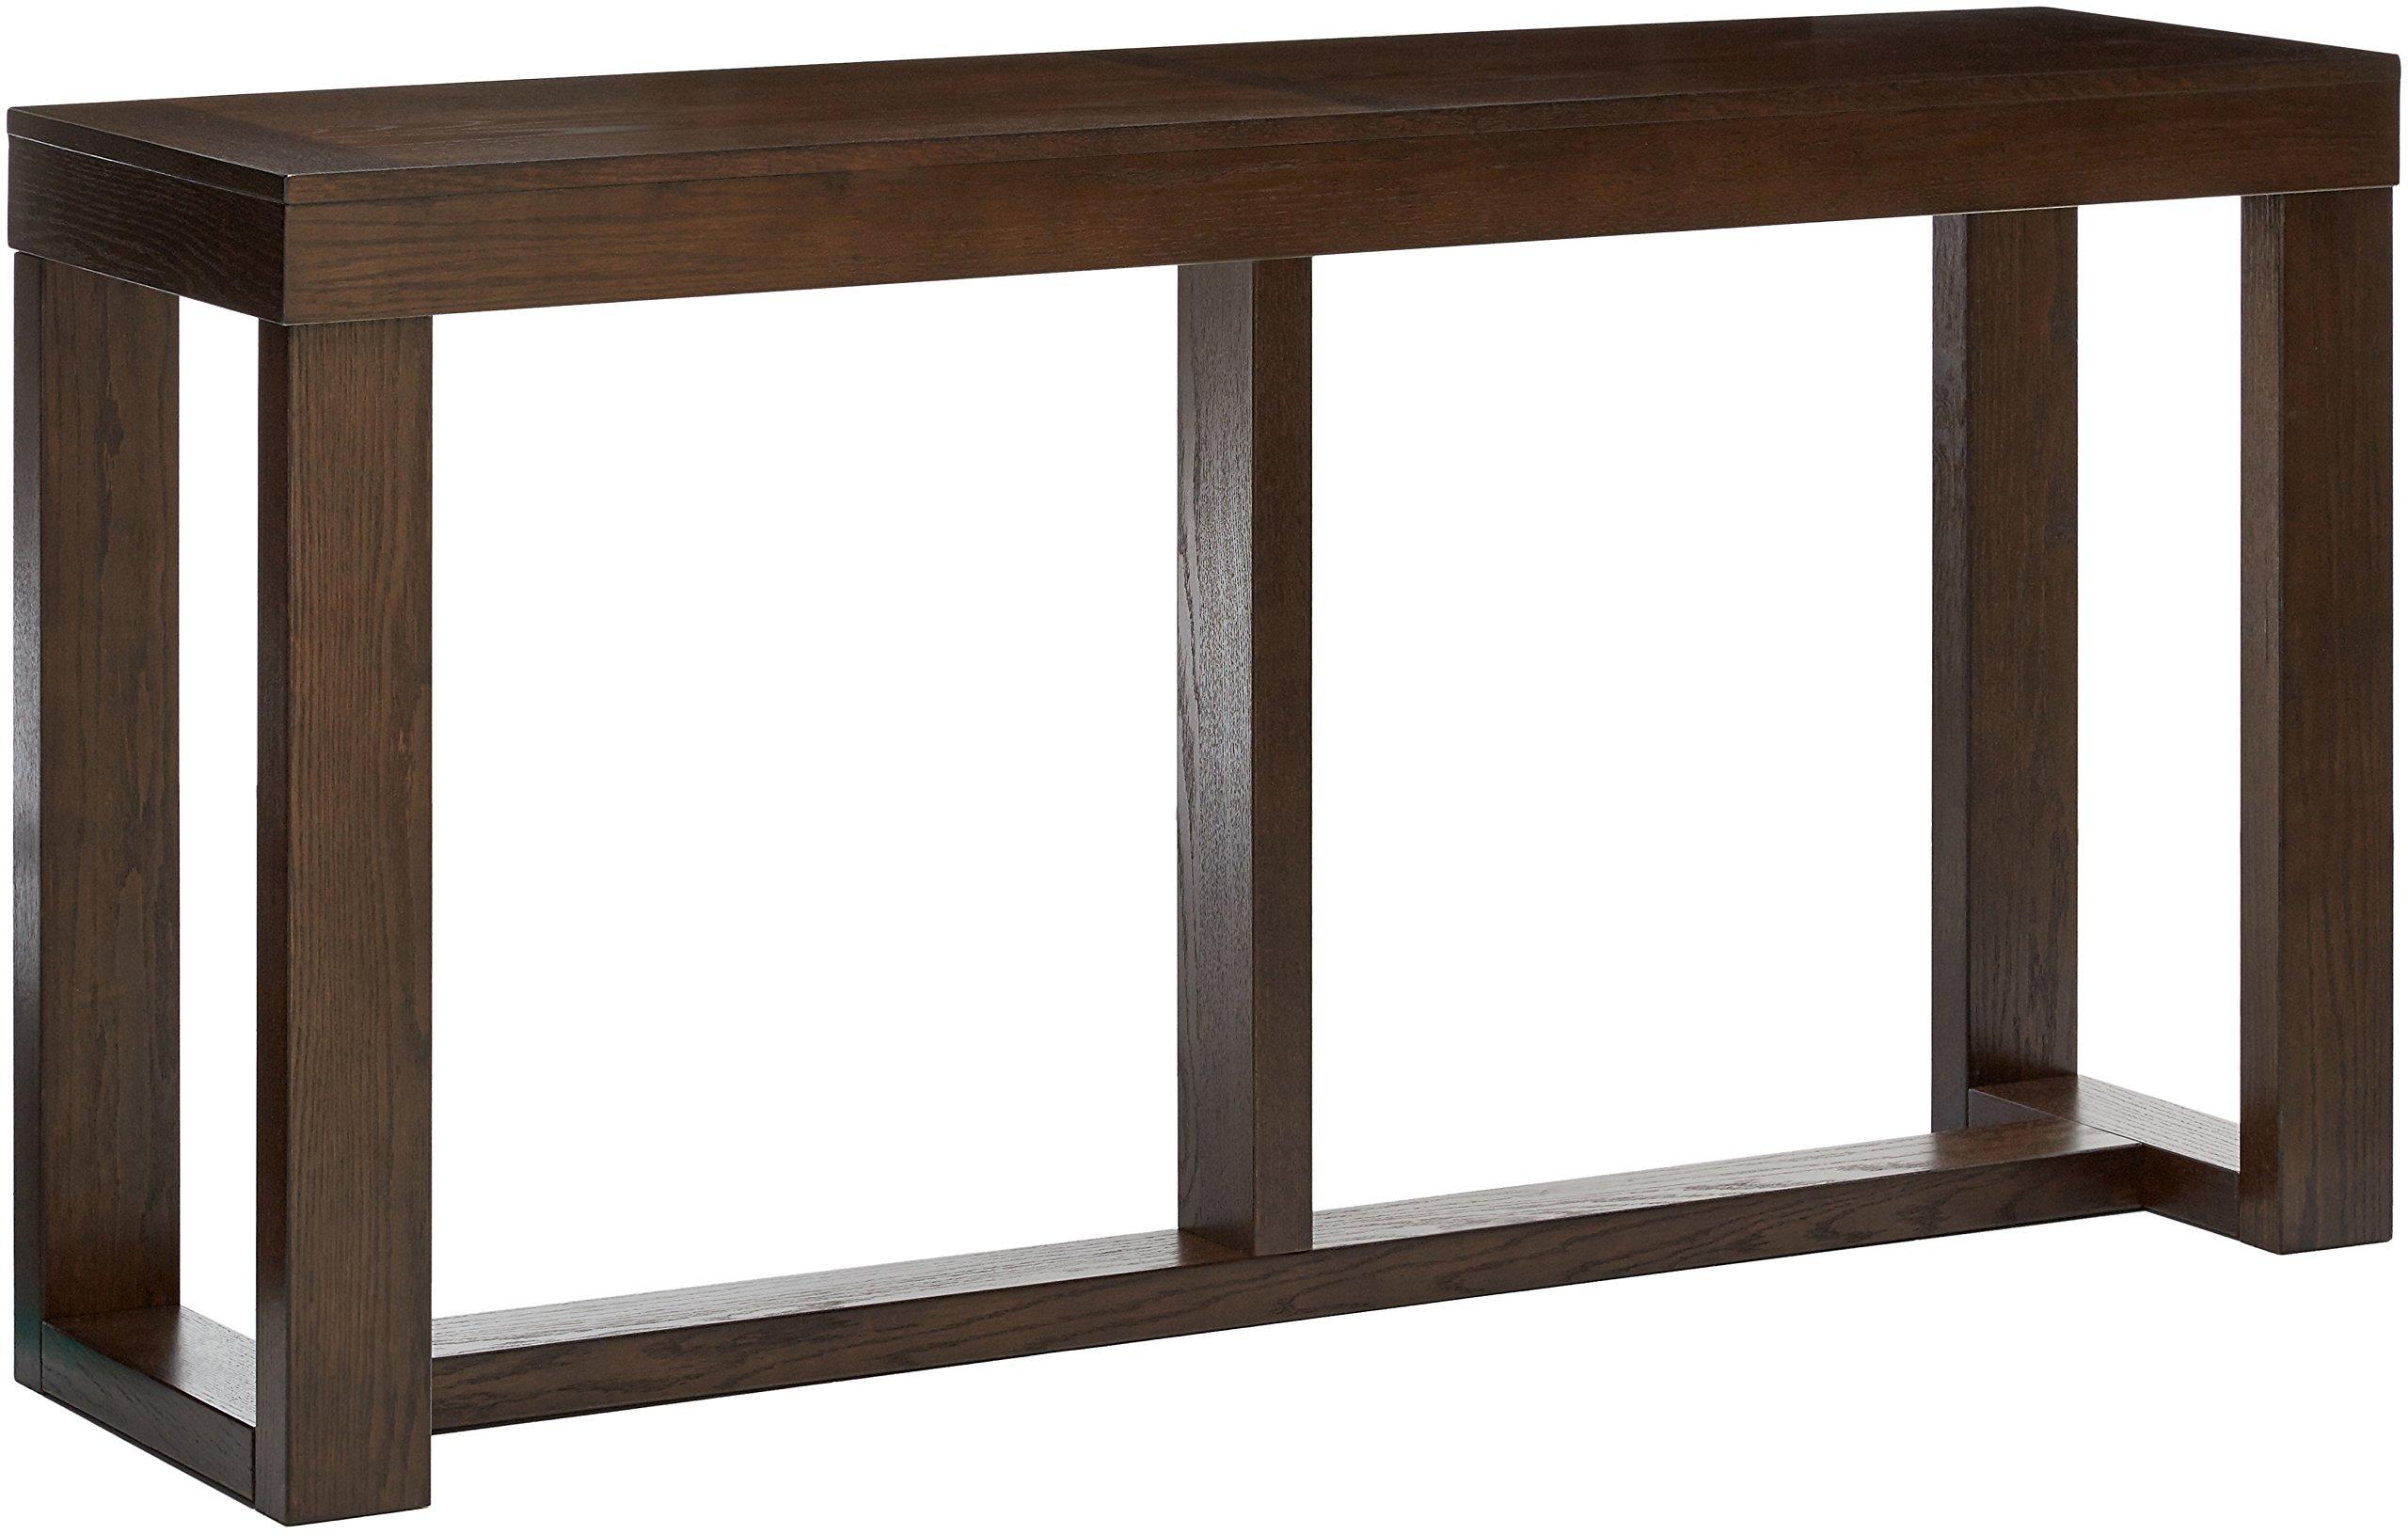 Ashley Furniture Signature Design - Watson Sofa Table - Rectangular - Contemporary Living - Dark Brown by Signature Design by Ashley